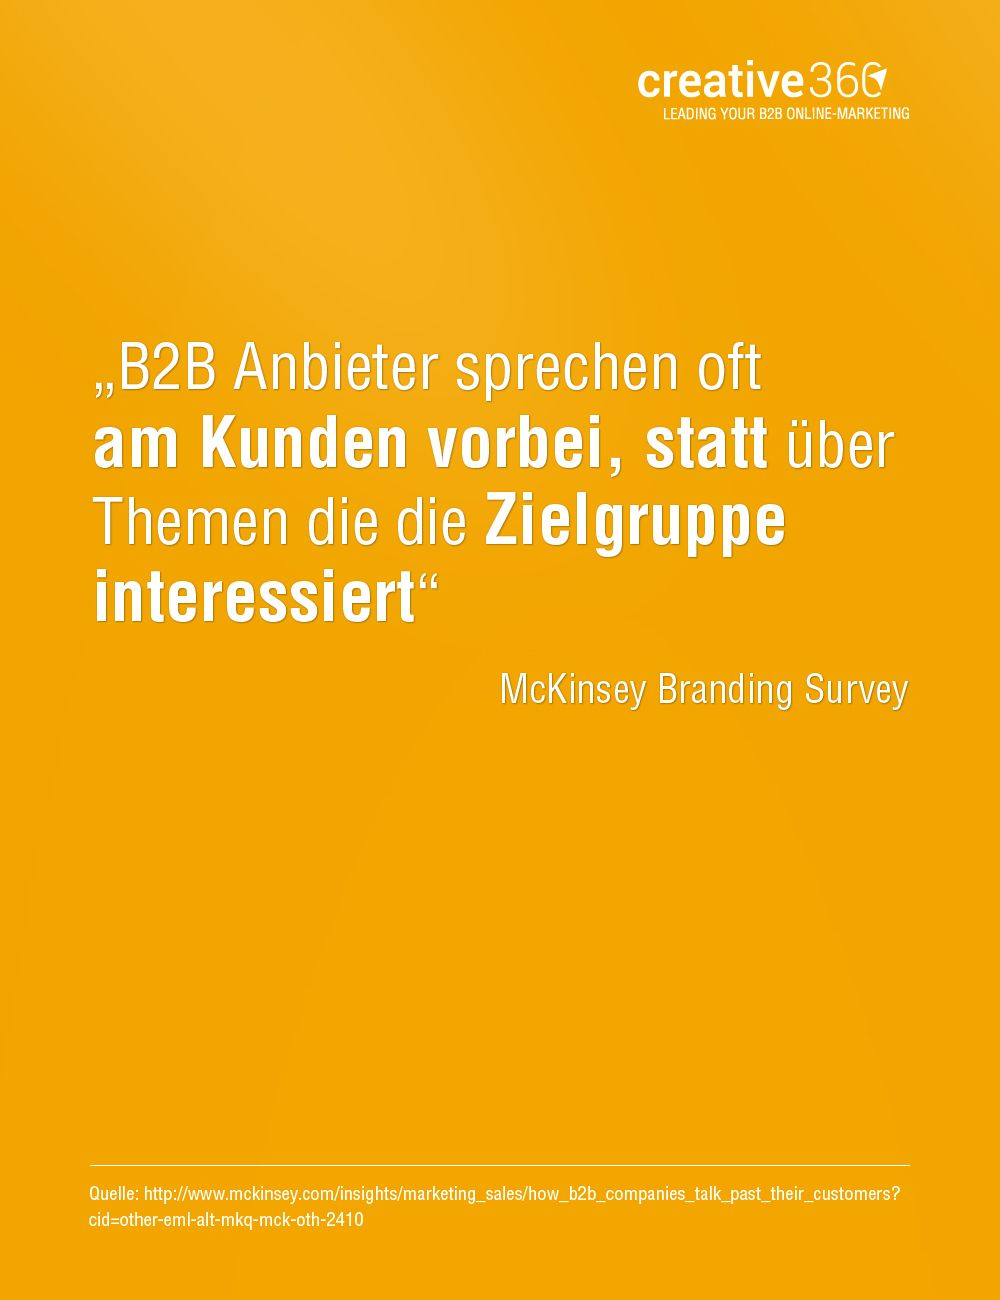 #B2B #TargetGroup #Zielgruppe #Kommunikation